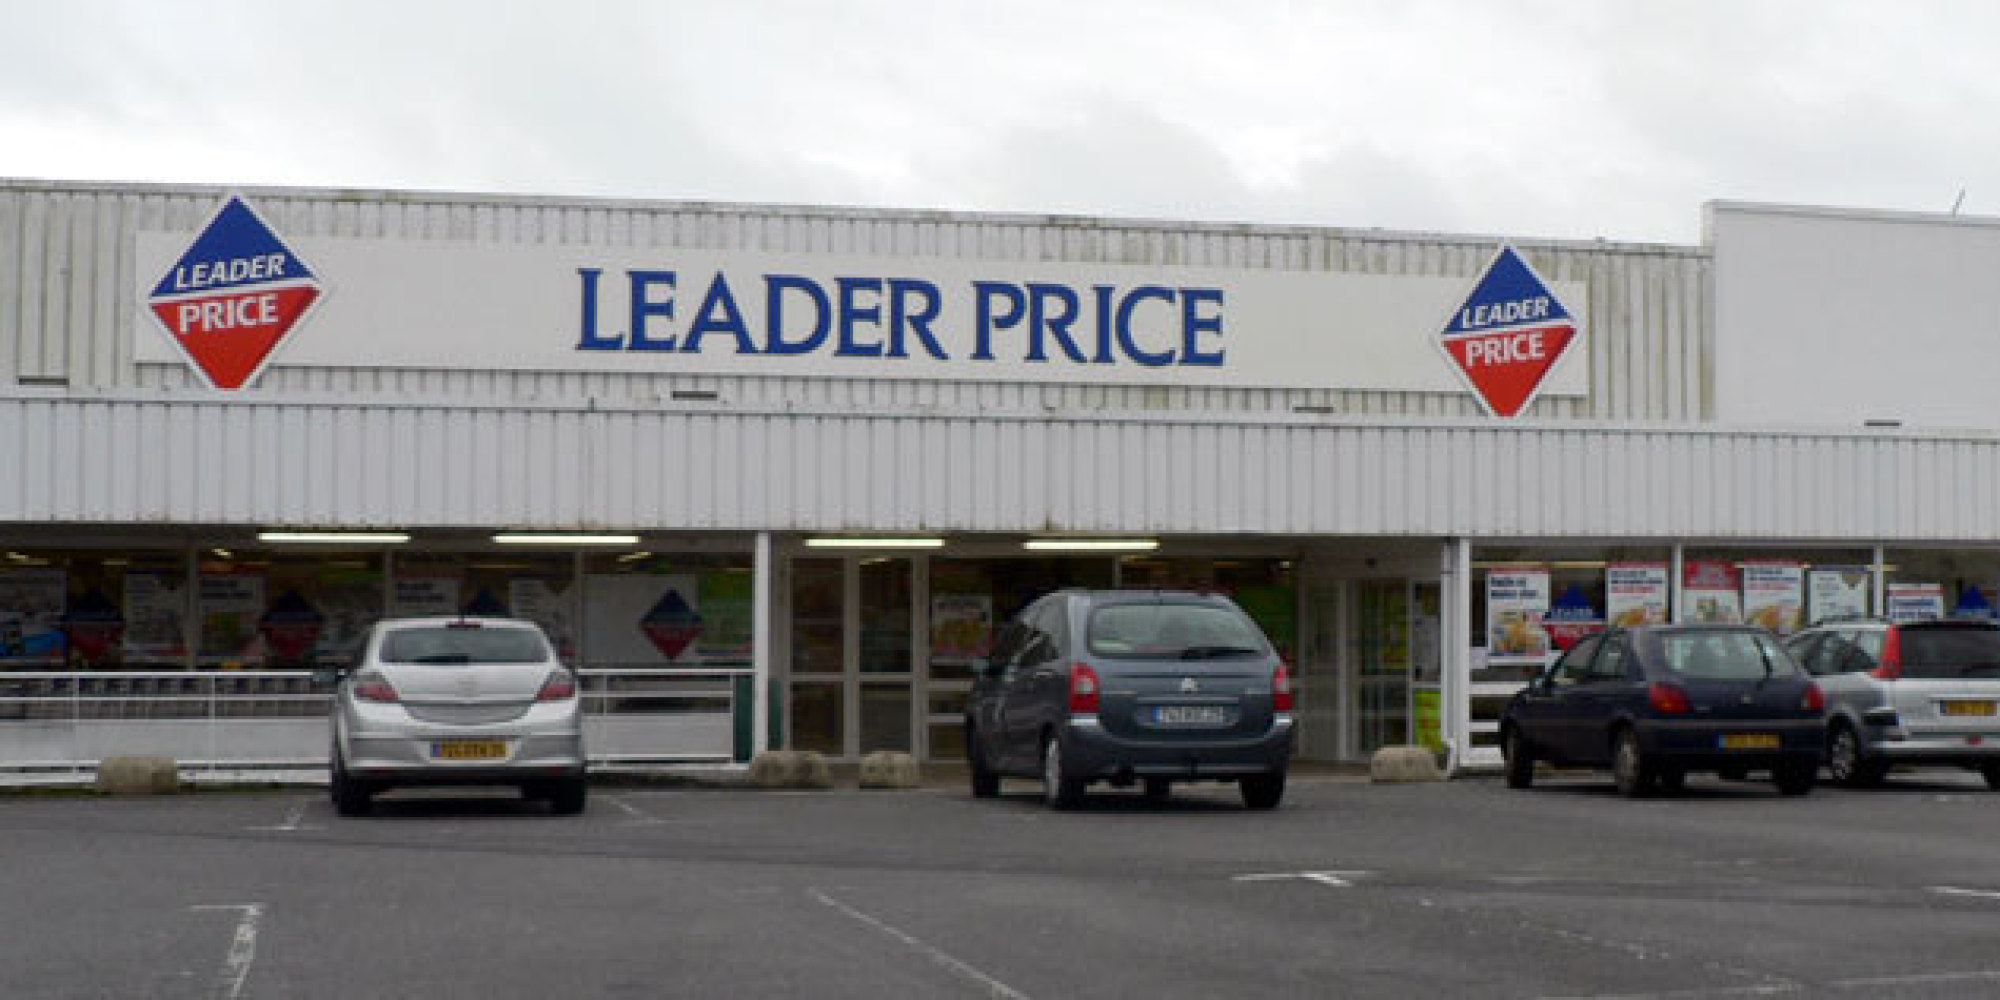 leader price ouvre aujourd 39 hui son premier magasin hard discount au maroc. Black Bedroom Furniture Sets. Home Design Ideas